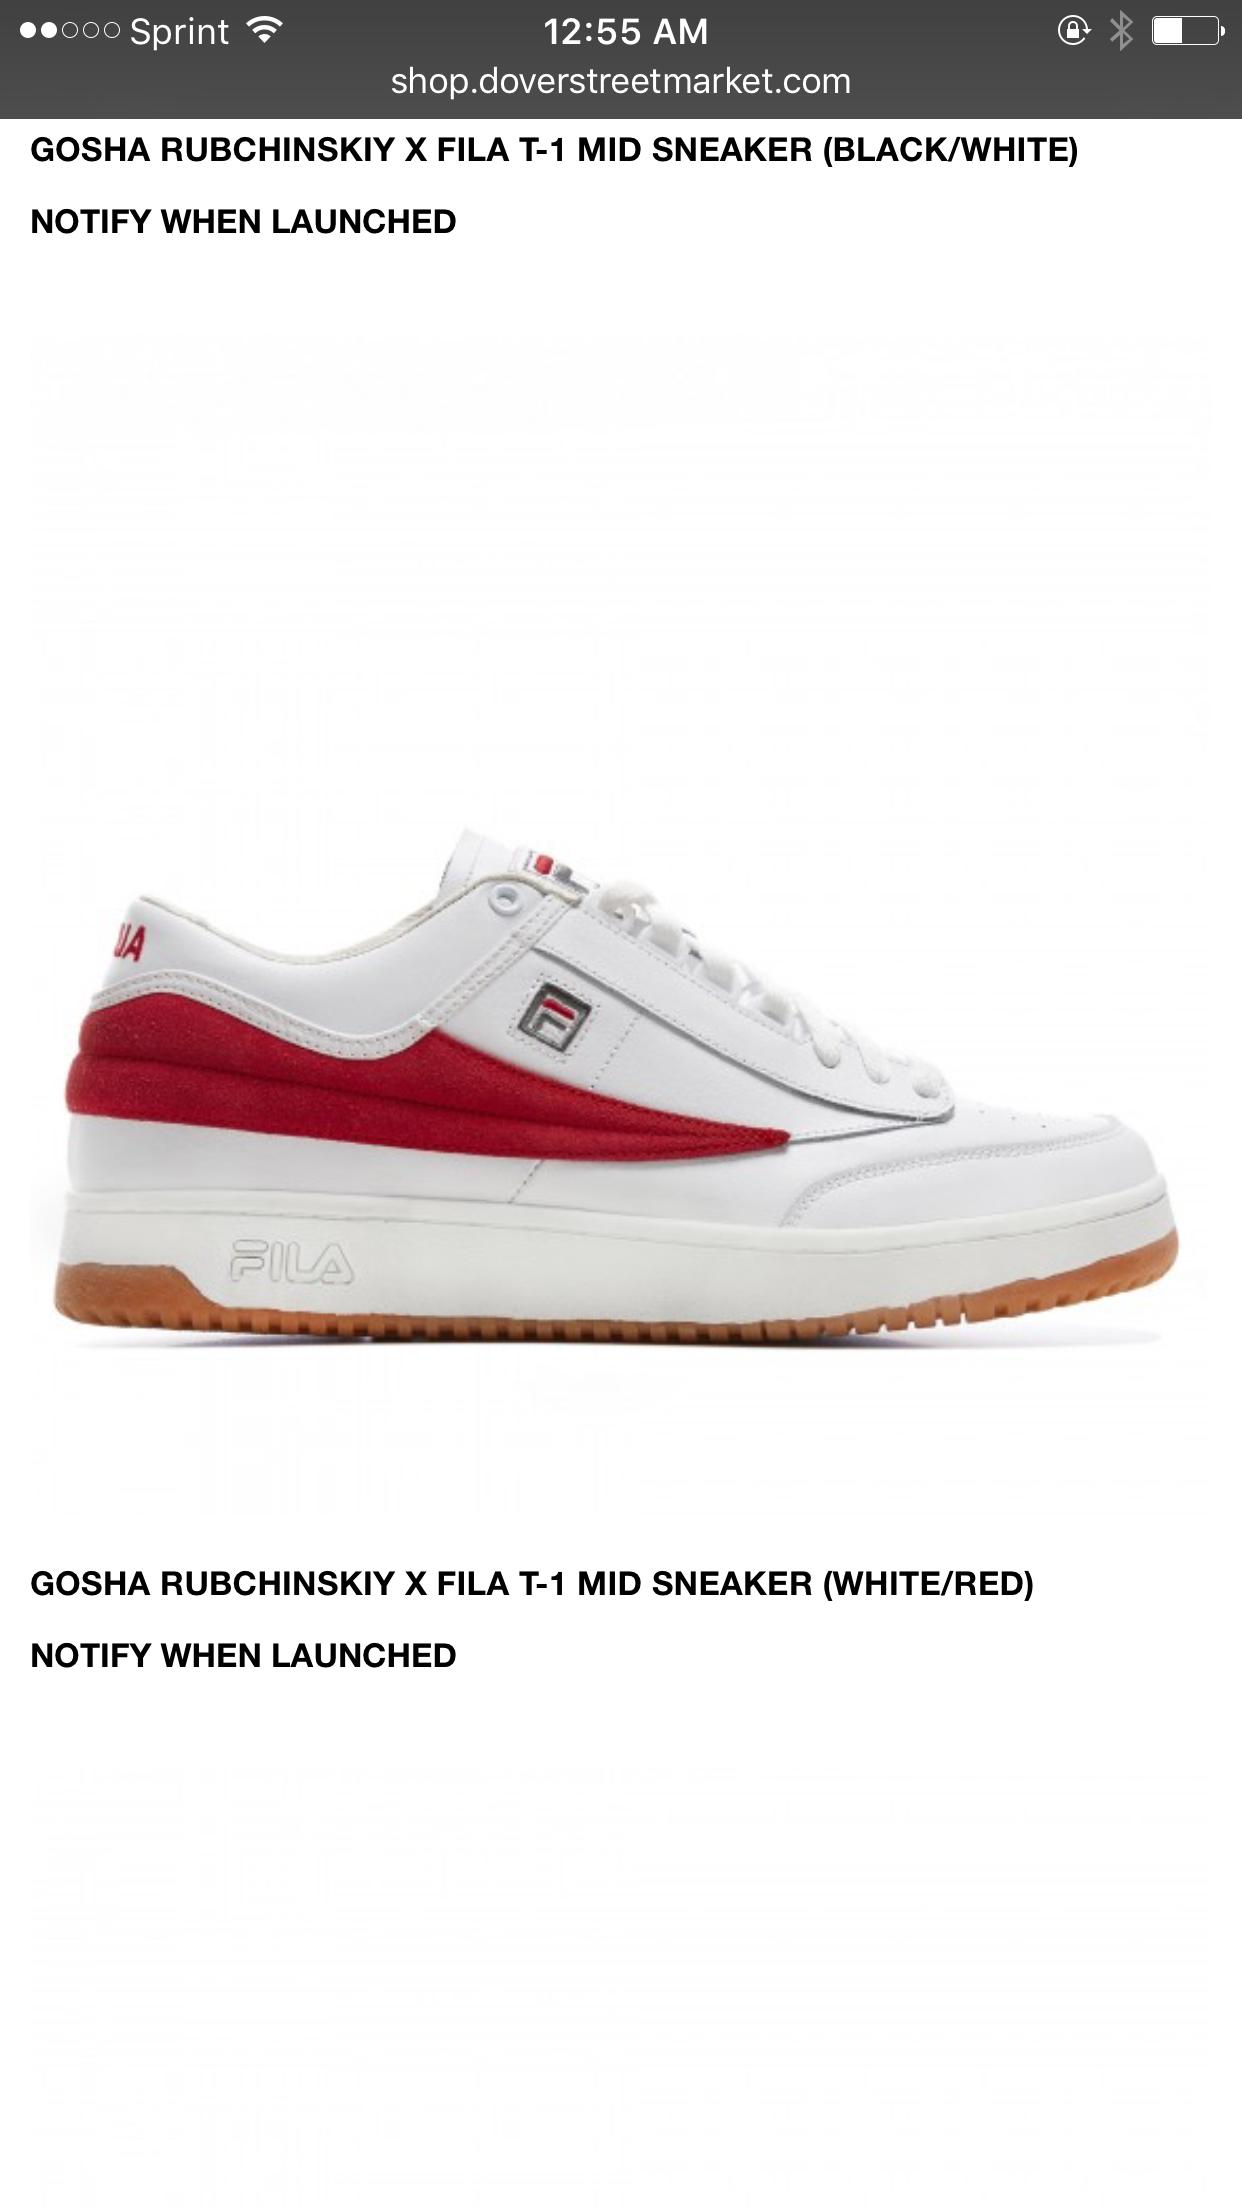 Fila T X 1 Gosha SneakerwhiteredShoes Mid Rubchinskiy PuikXZO